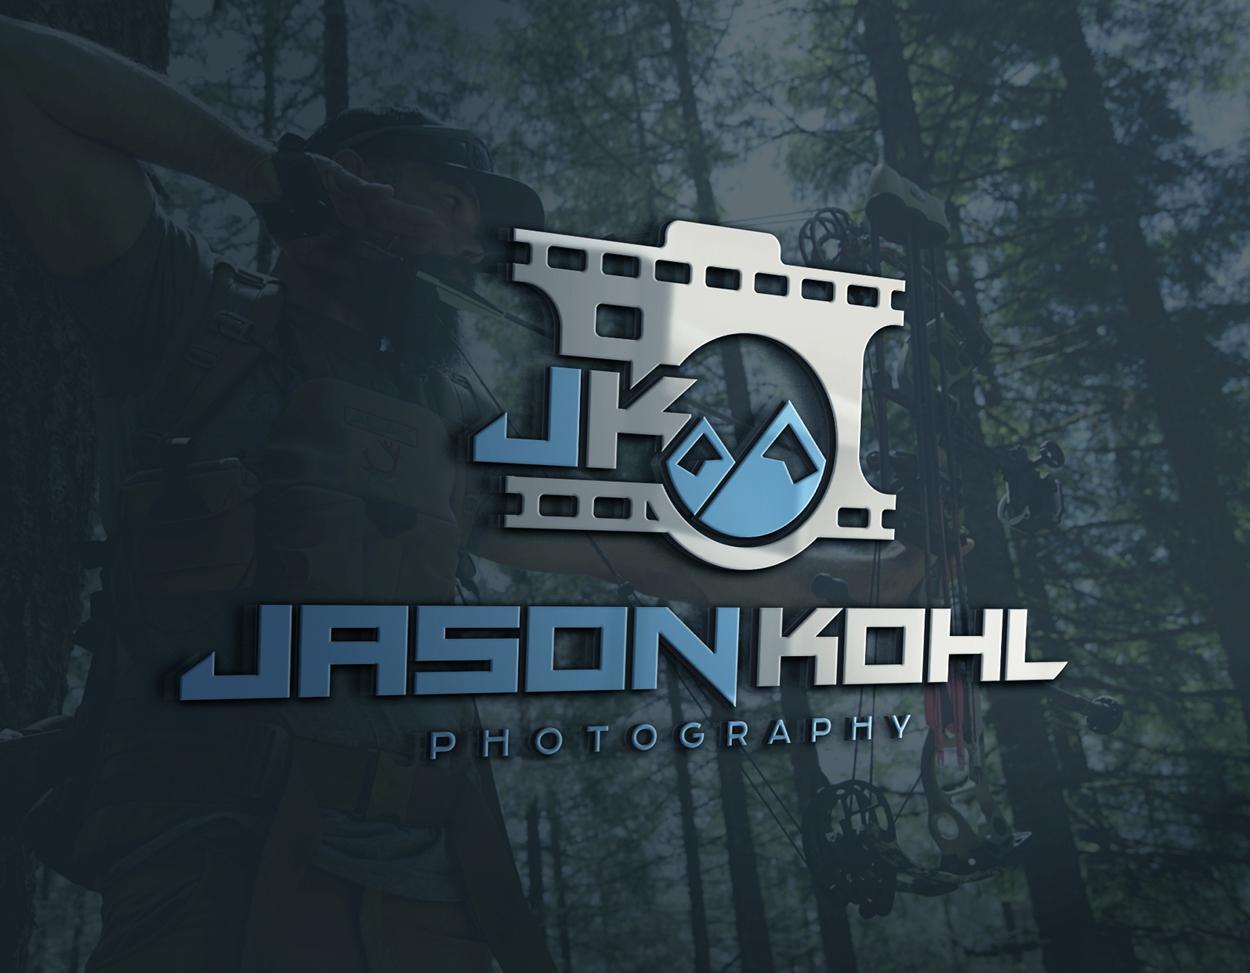 Jason Kohl Outdoor Photography Logo Design